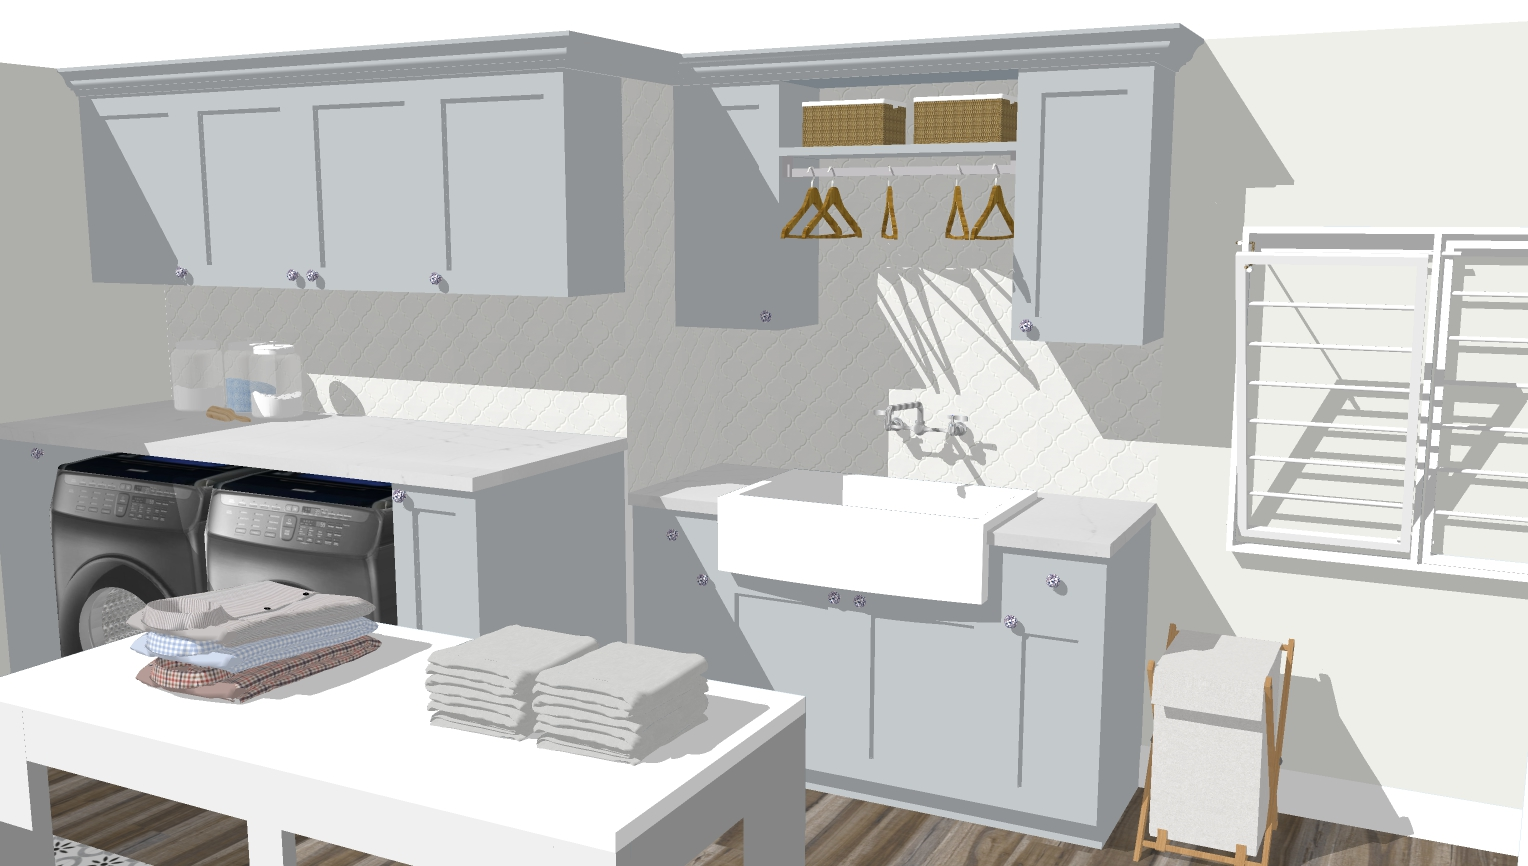 amaletta basement12.jpg